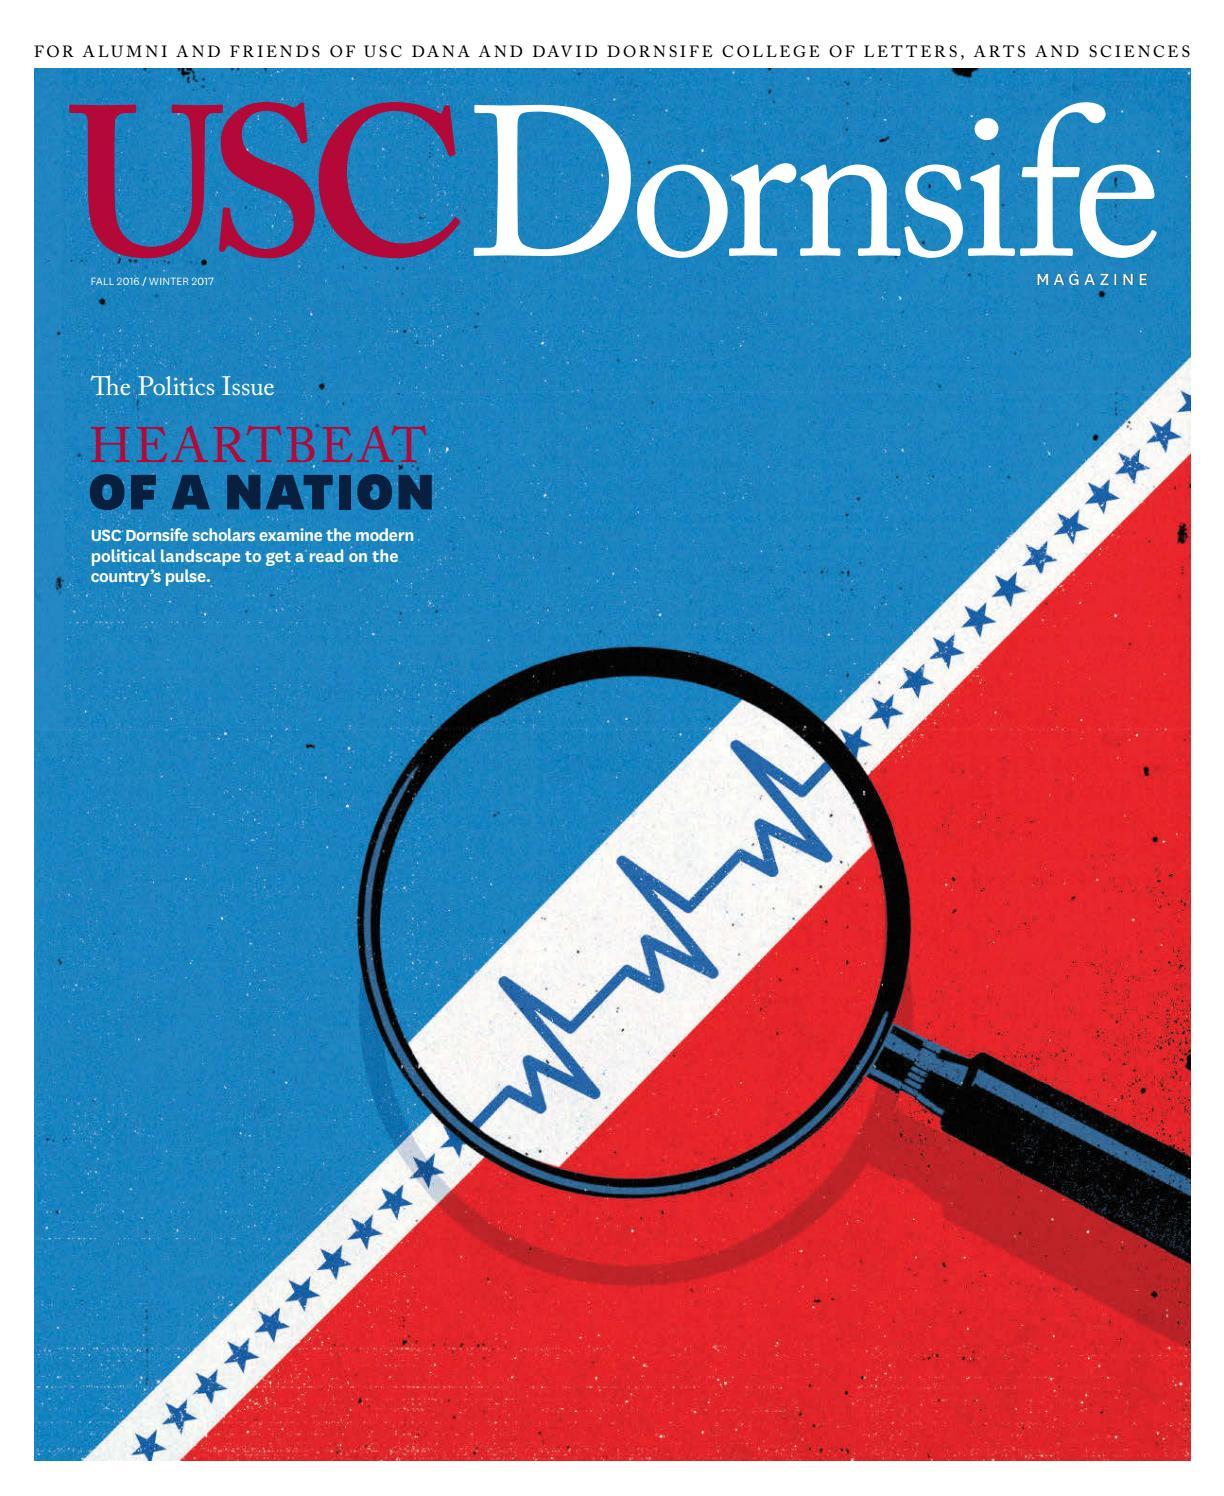 USC Dornsife Magazine Fall 2016-Winter 2017 by USC Dornsife